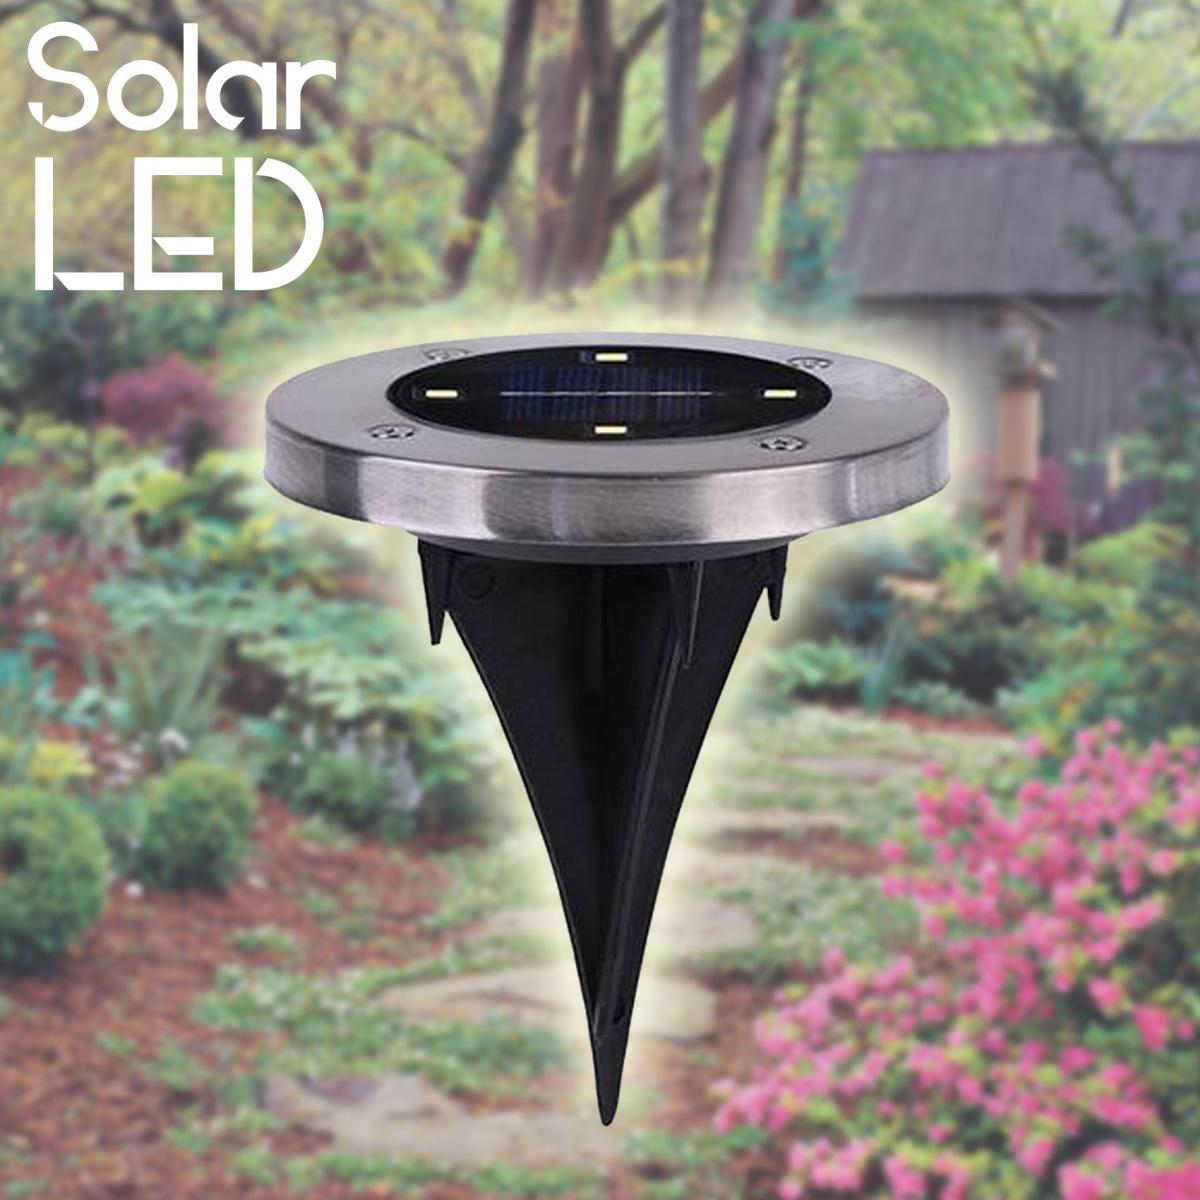 Waterproof 4 LED Light Outdoor Garden Path Solar Lamp - Silver